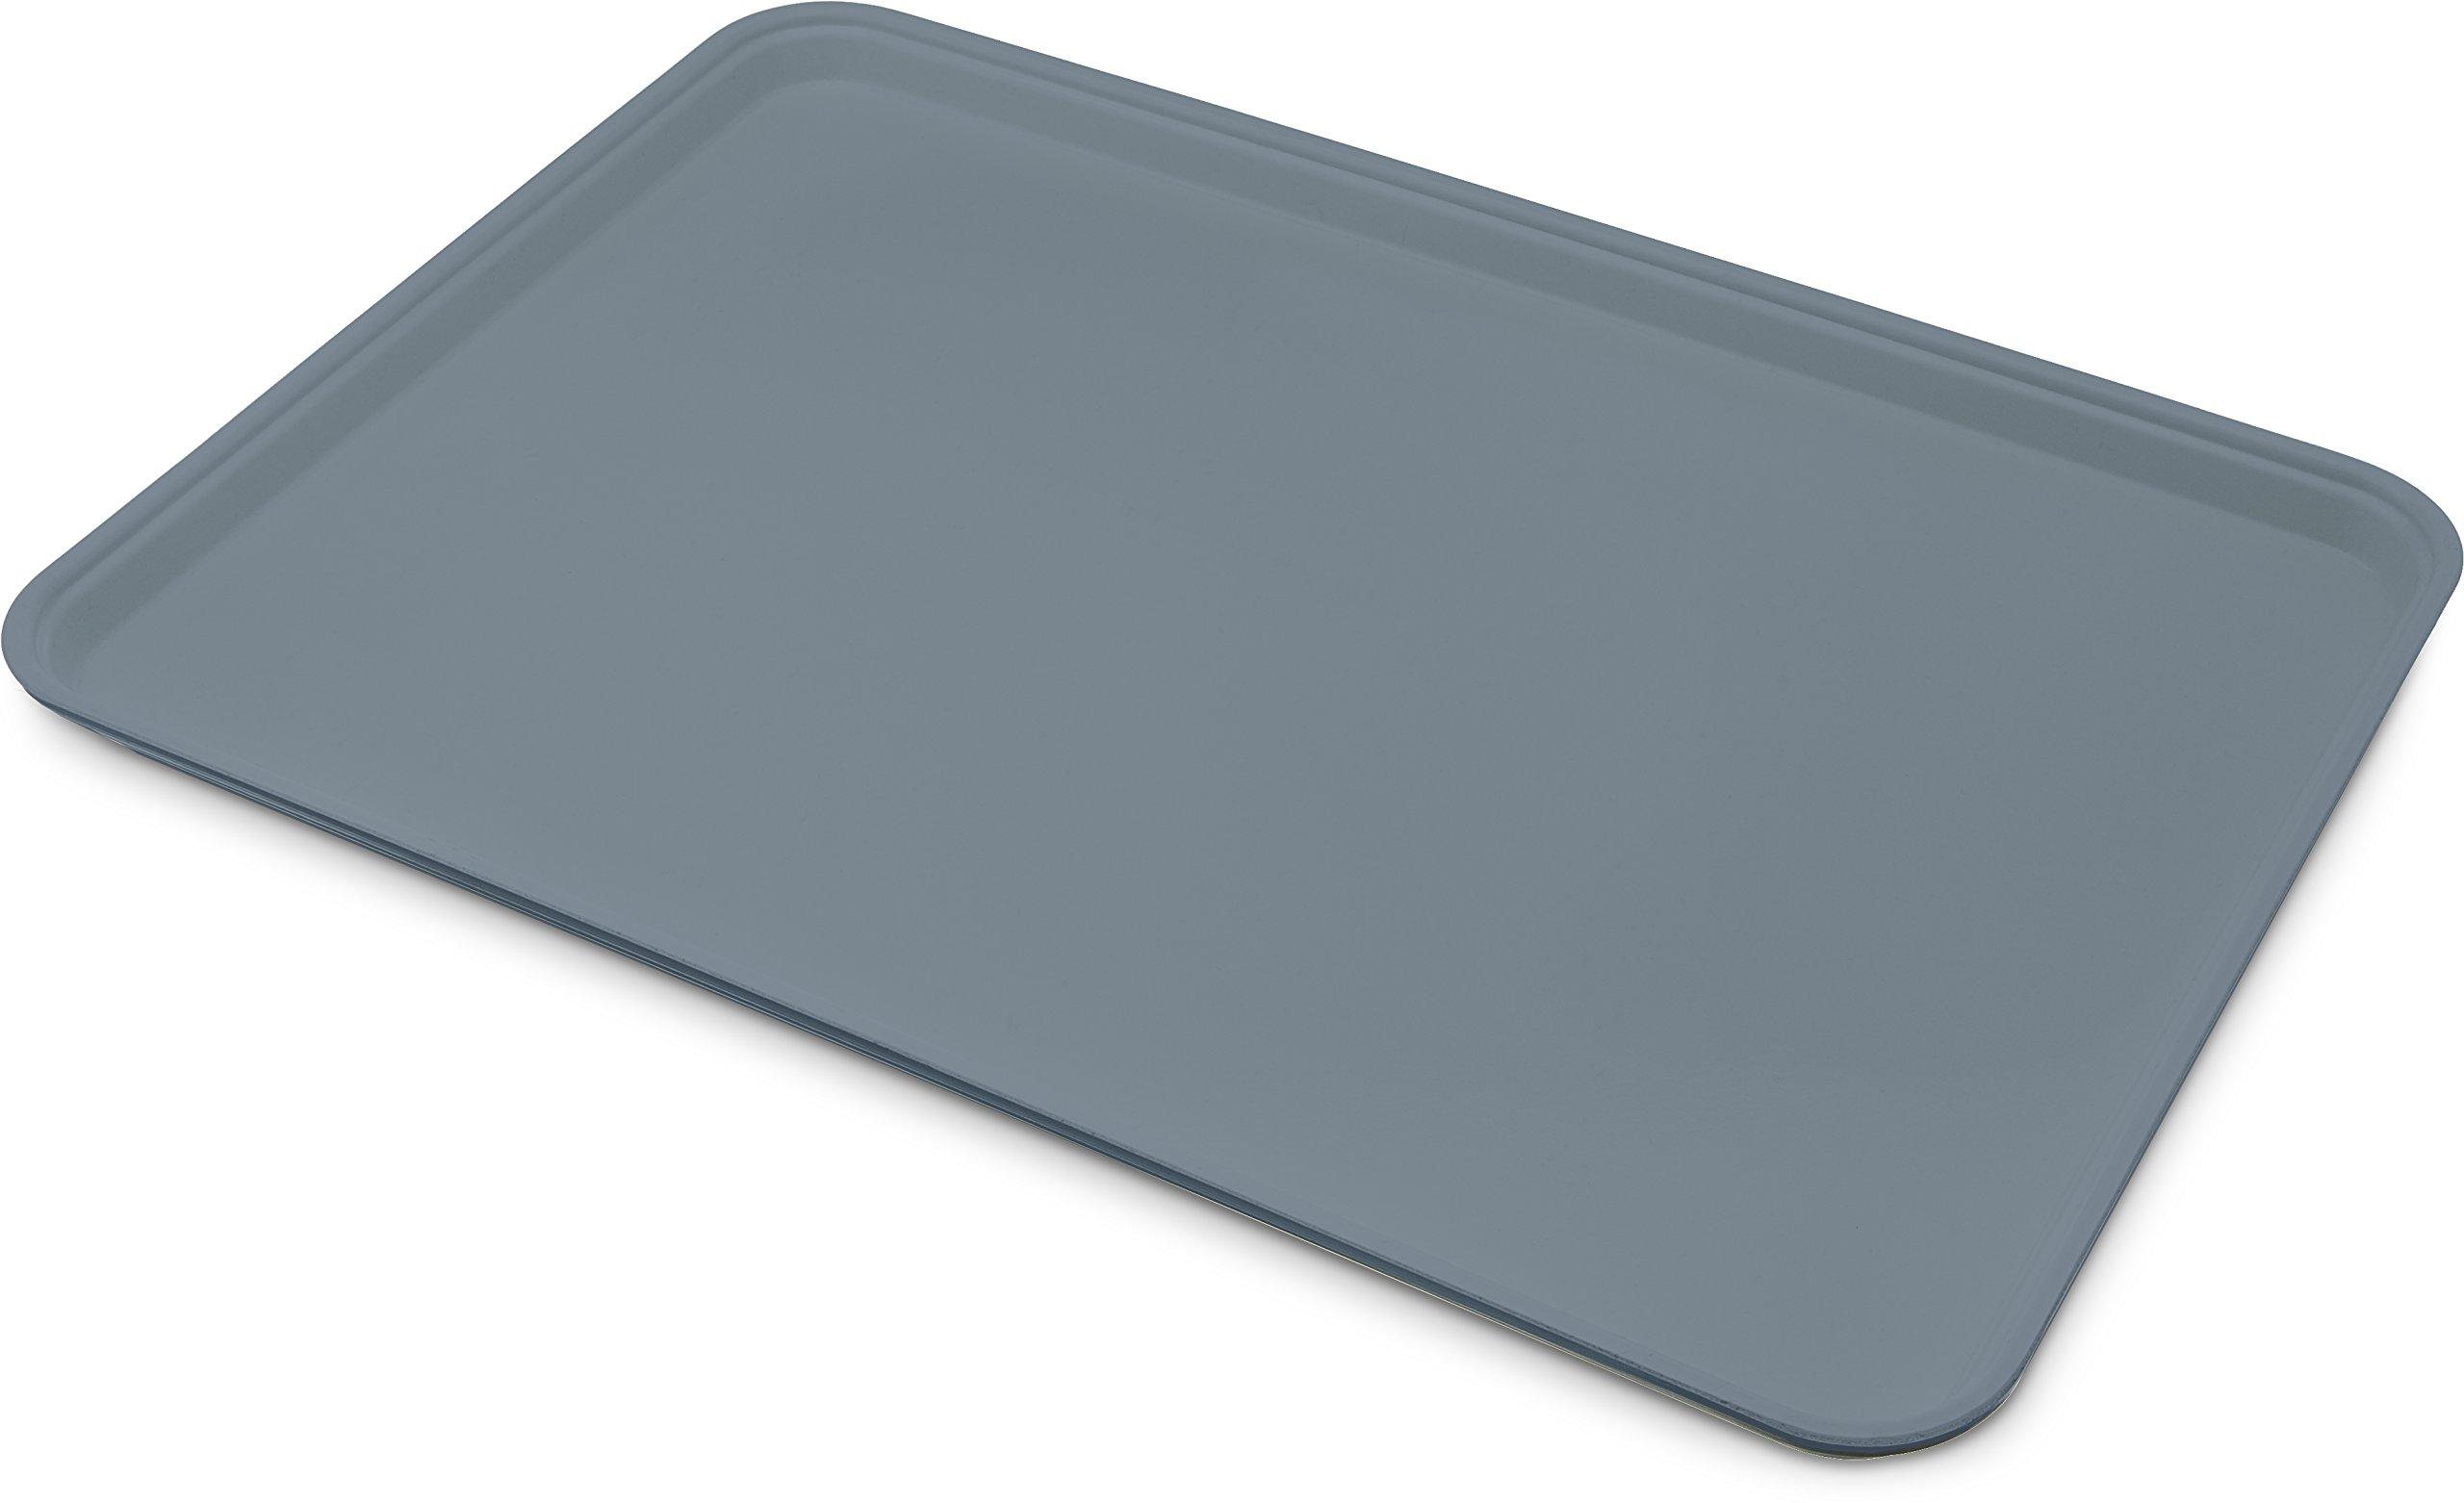 Carlisle 1318FG067 Fiberglass Glasteel Solid Display/Bakery Tray, 17.75'' x 12.75'', Slate Blue (Case of 12)